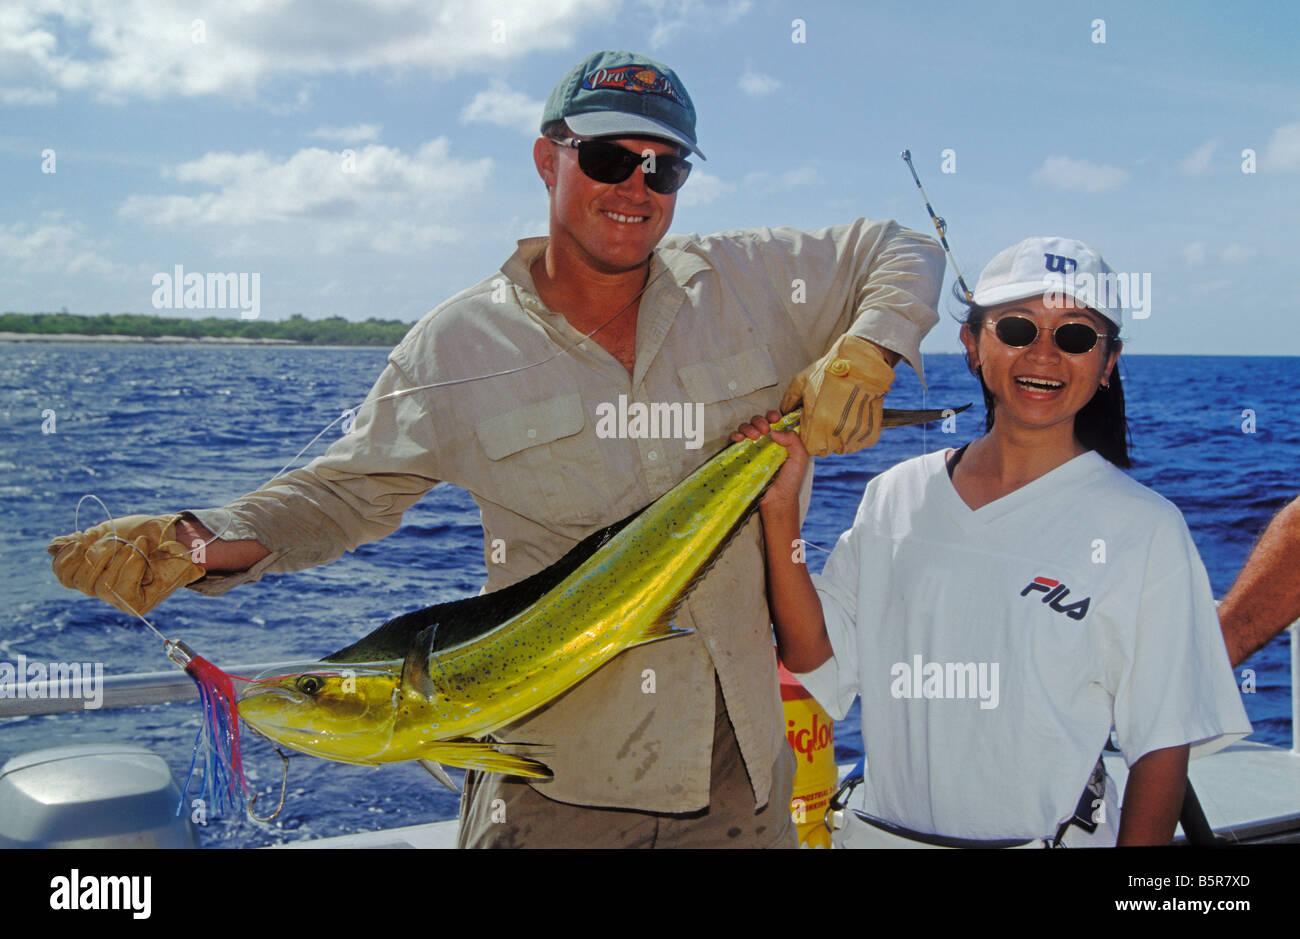 Marshall Islands Micronesia Fishing Guide Rod Bourke and Japanese visitor Yuki Nakako with Mahimahi caught at Bikini - Stock Image